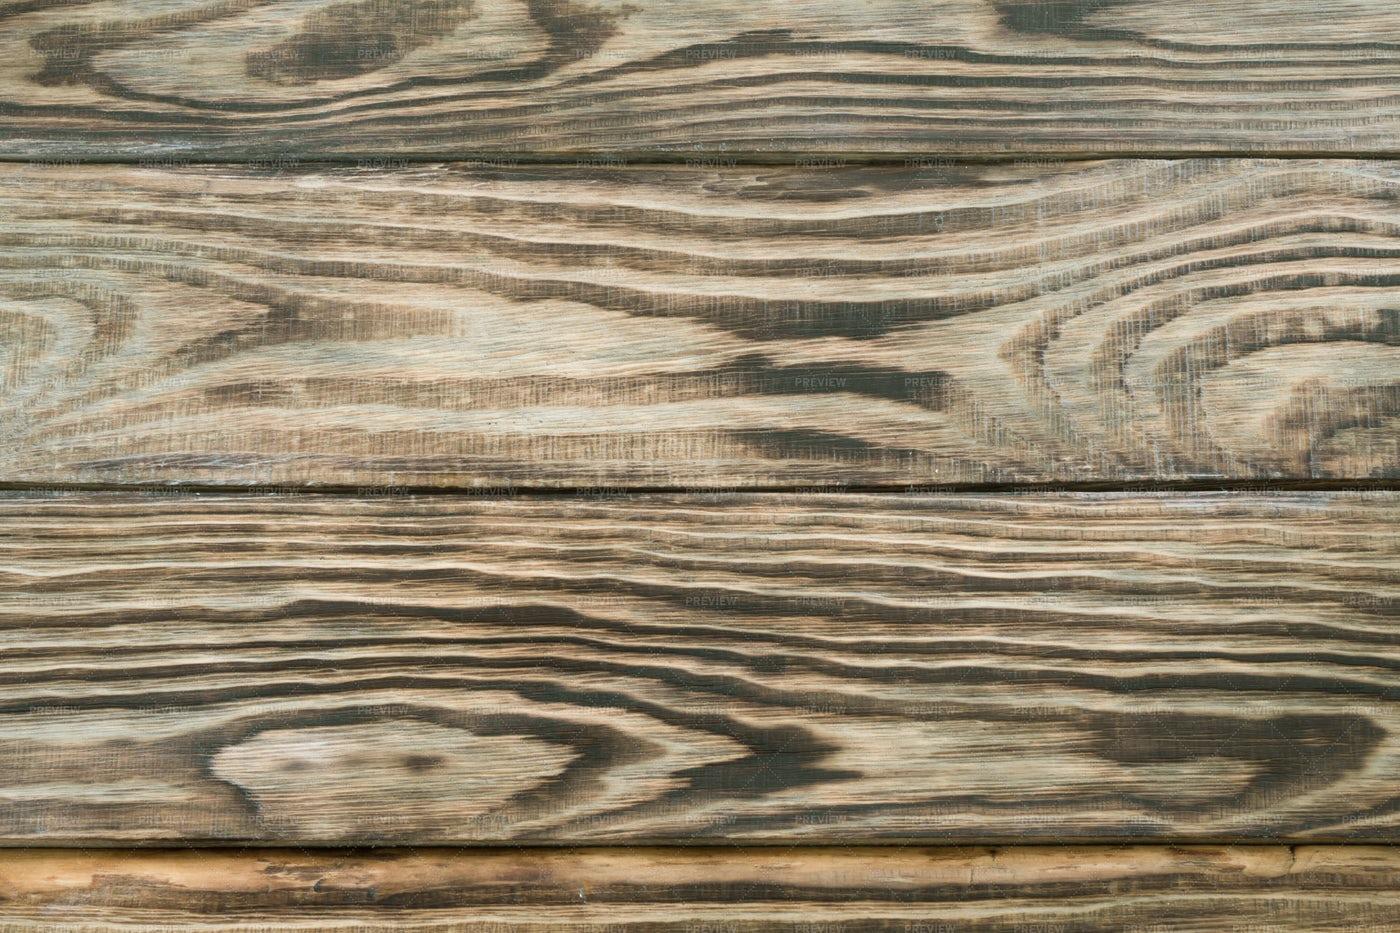 Burnt Wooden Background: Stock Photos